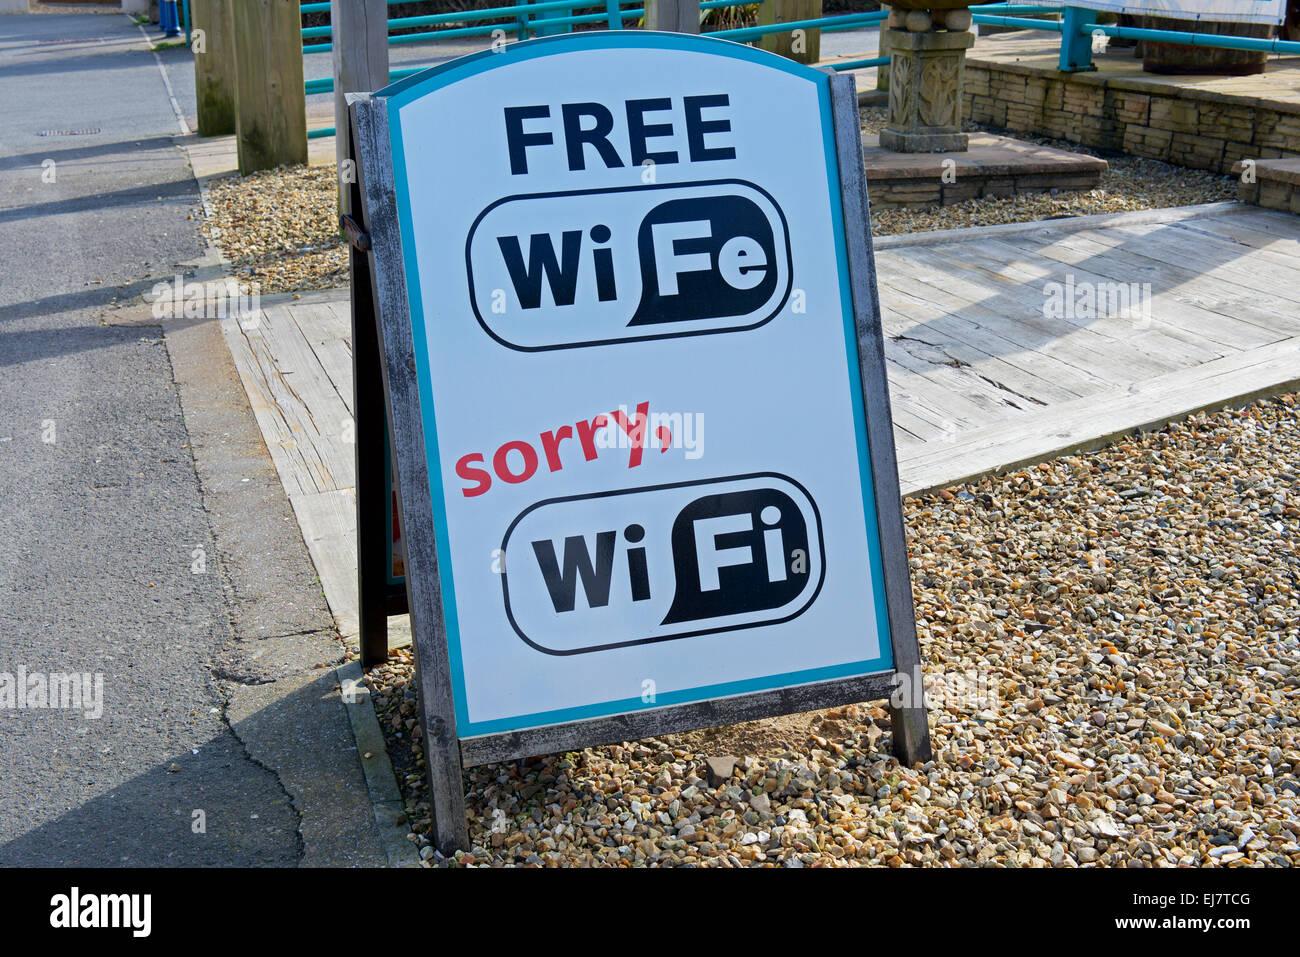 Sign - free wi-fe, sorry wi-fi - outside pub, England - Stock Image